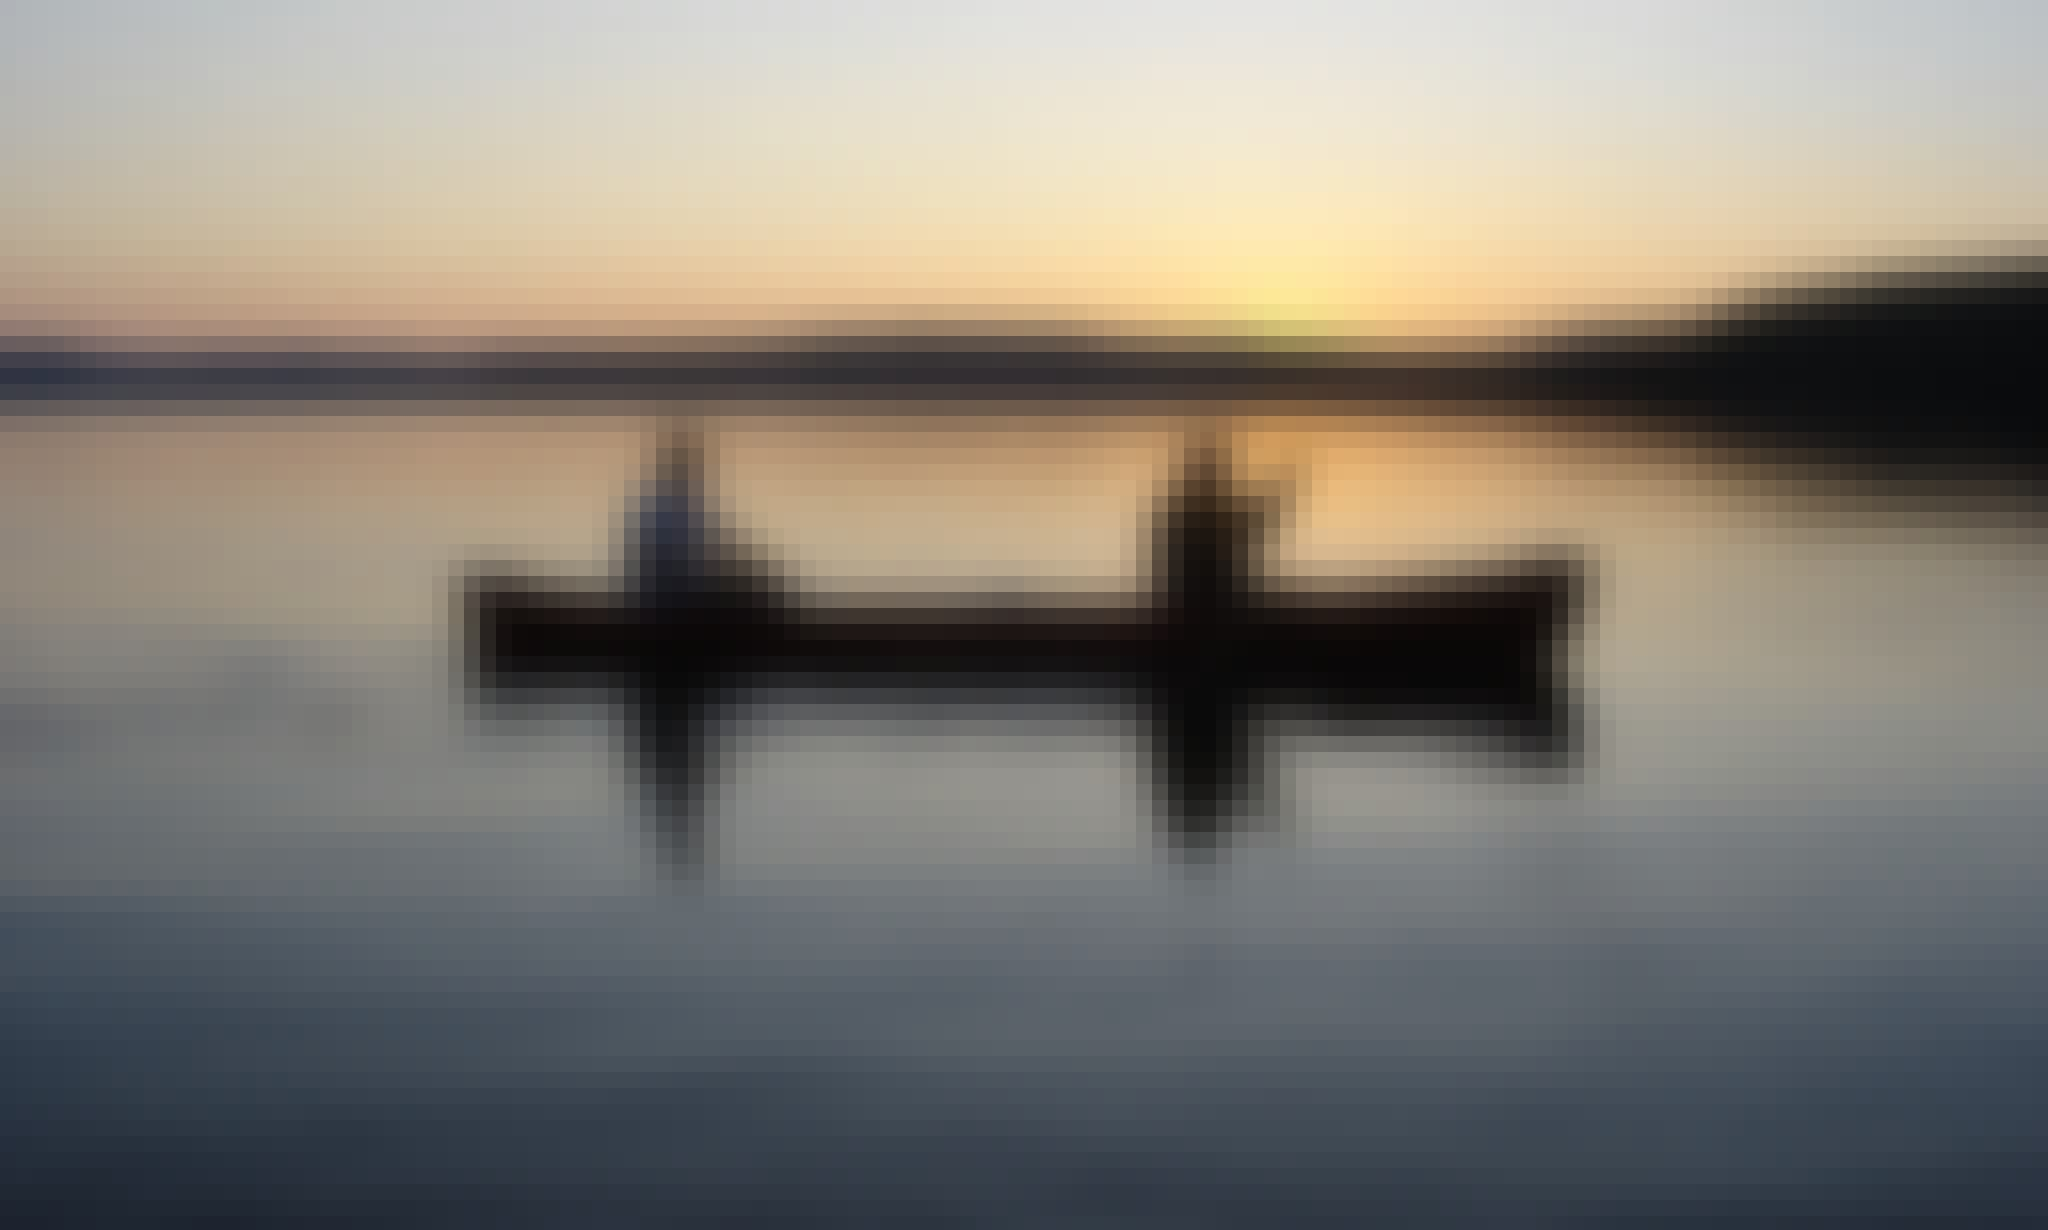 Canoe Rental on Trout Lake, Ontario